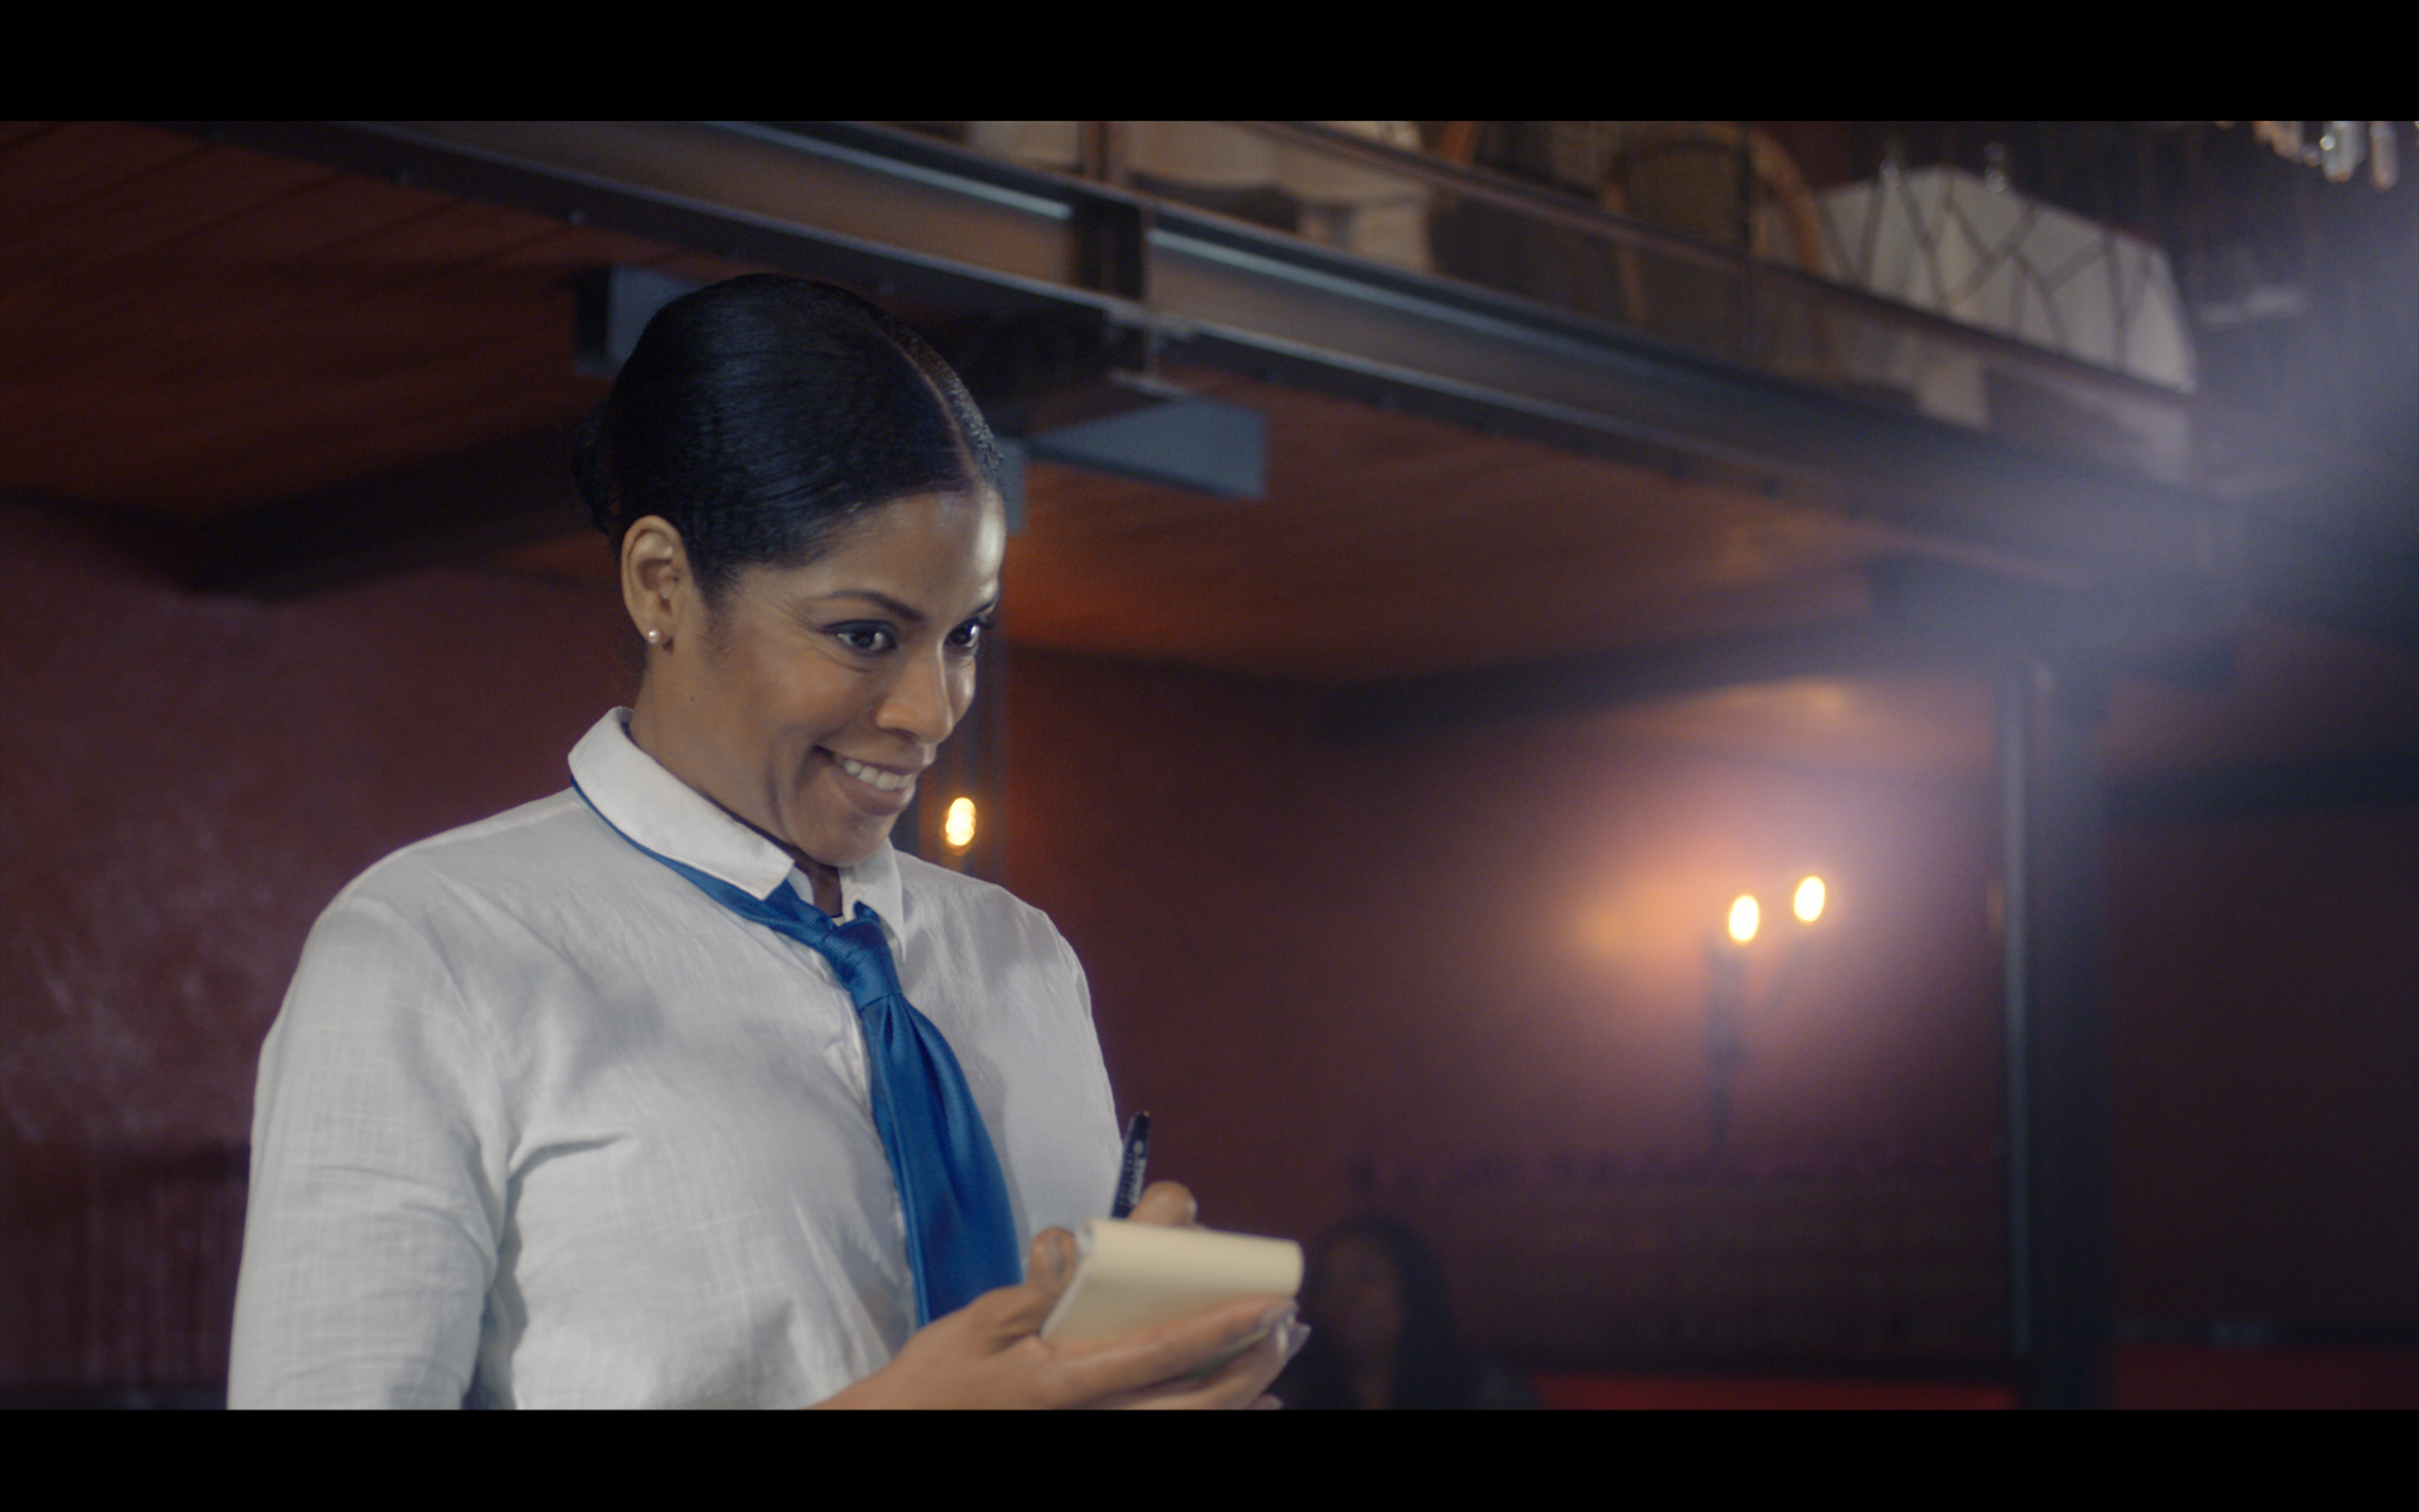 waitresslady.jpg